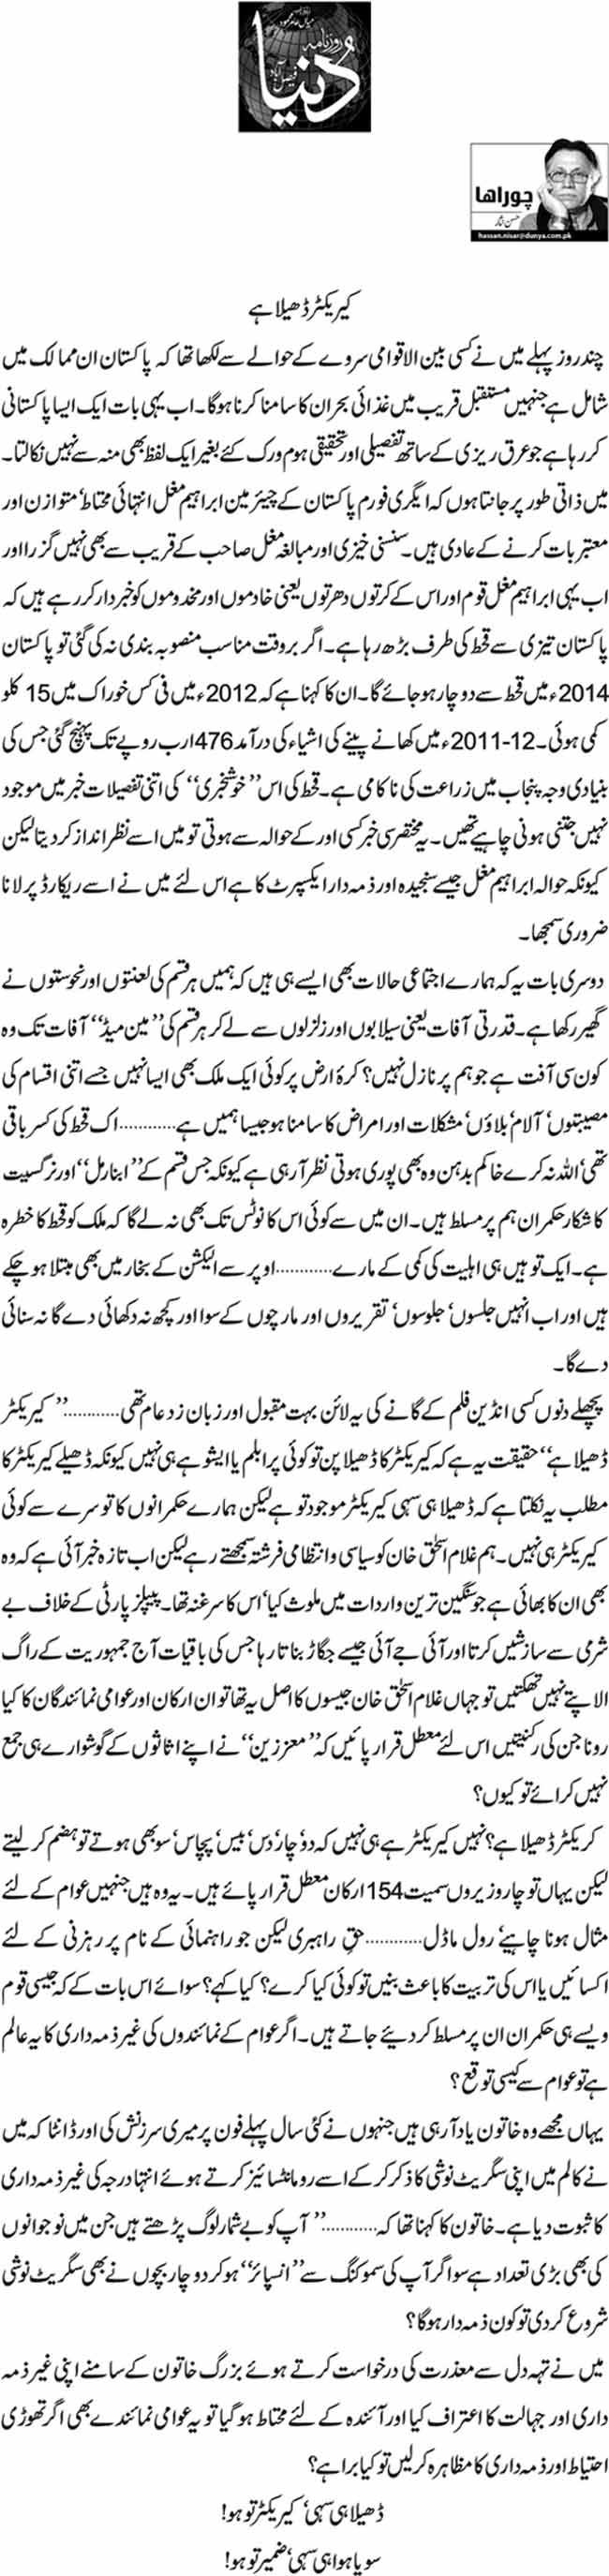 Charcter dehla ha - Hassan Nisar